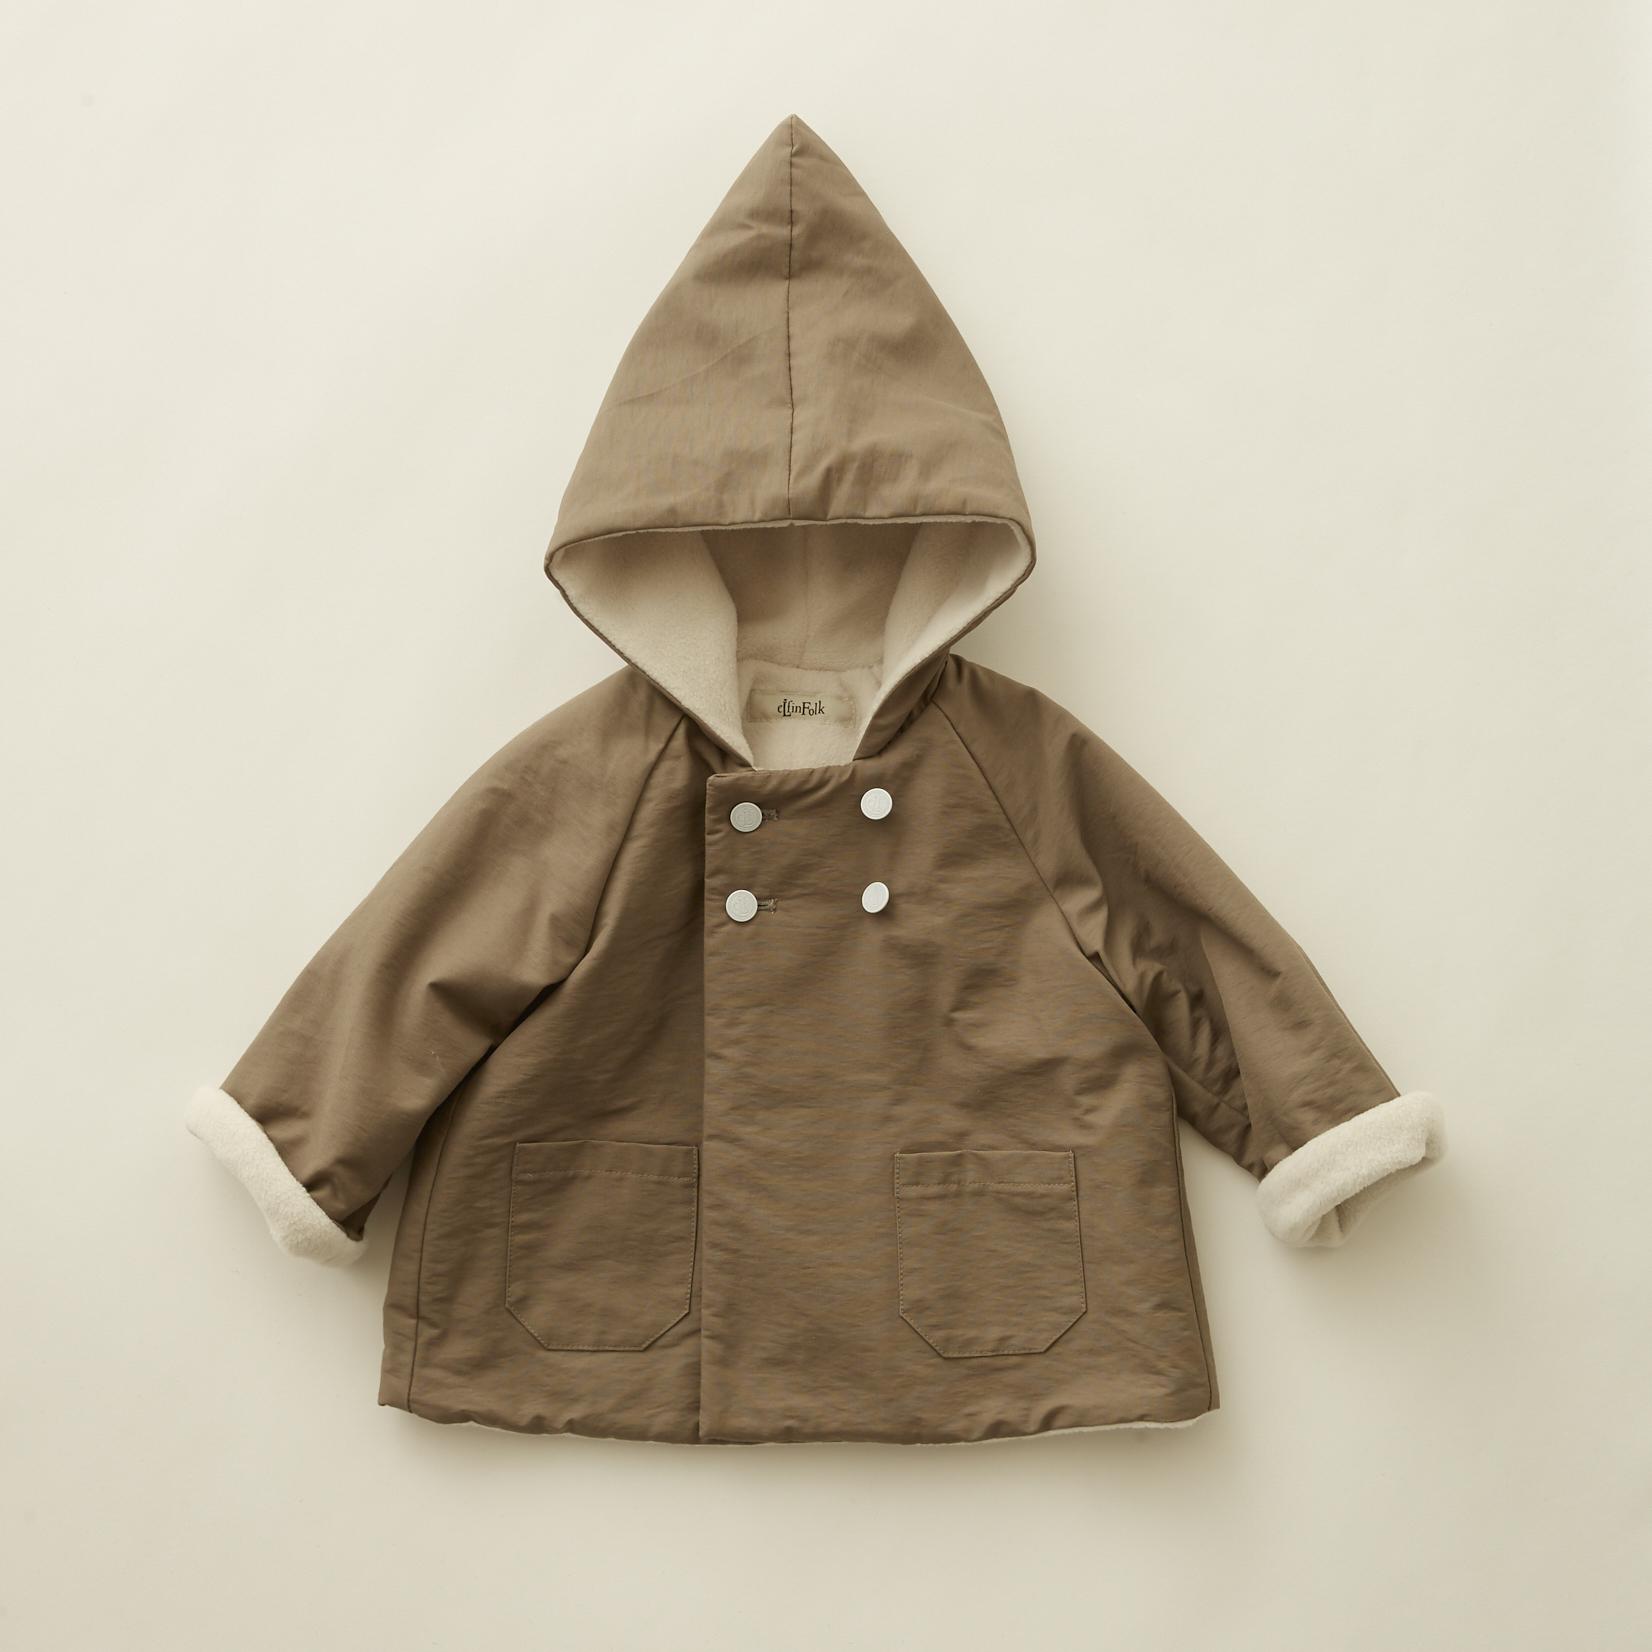 《eLfinFolk 2020AW》elf coat / mocha / 90-100cm